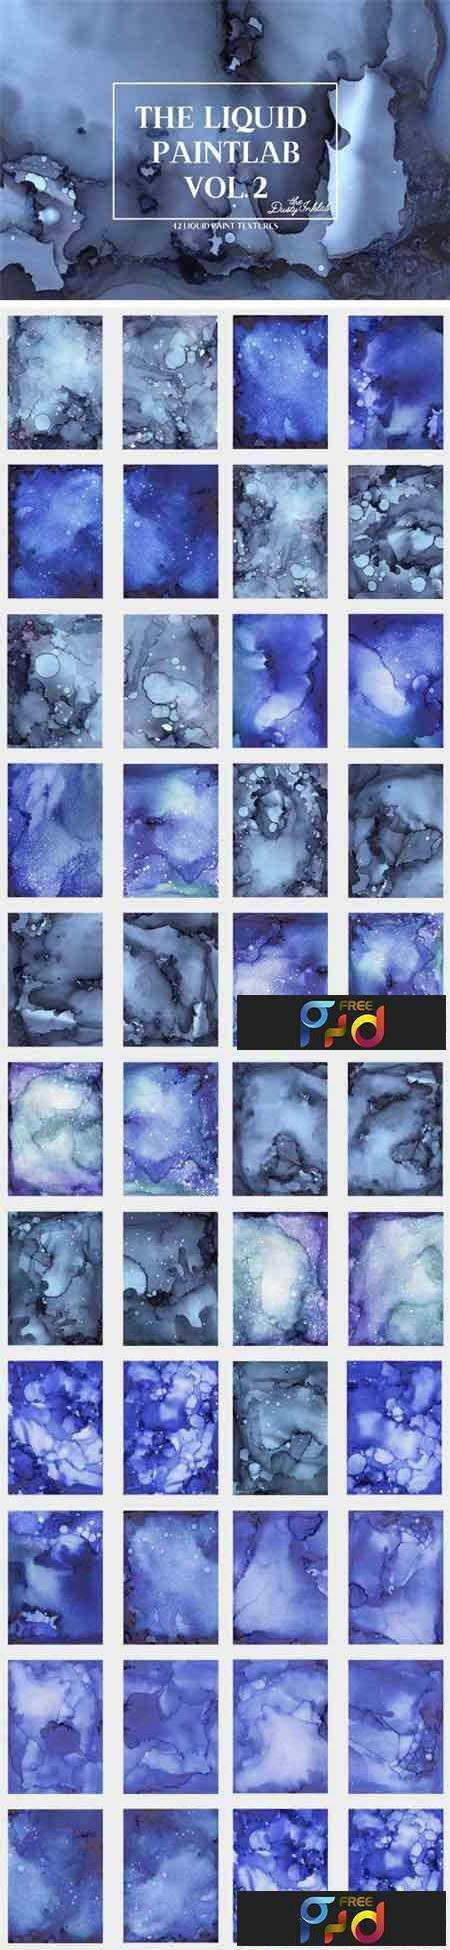 1707177 The Liquid Paintlab Vol. 2 1971435 1